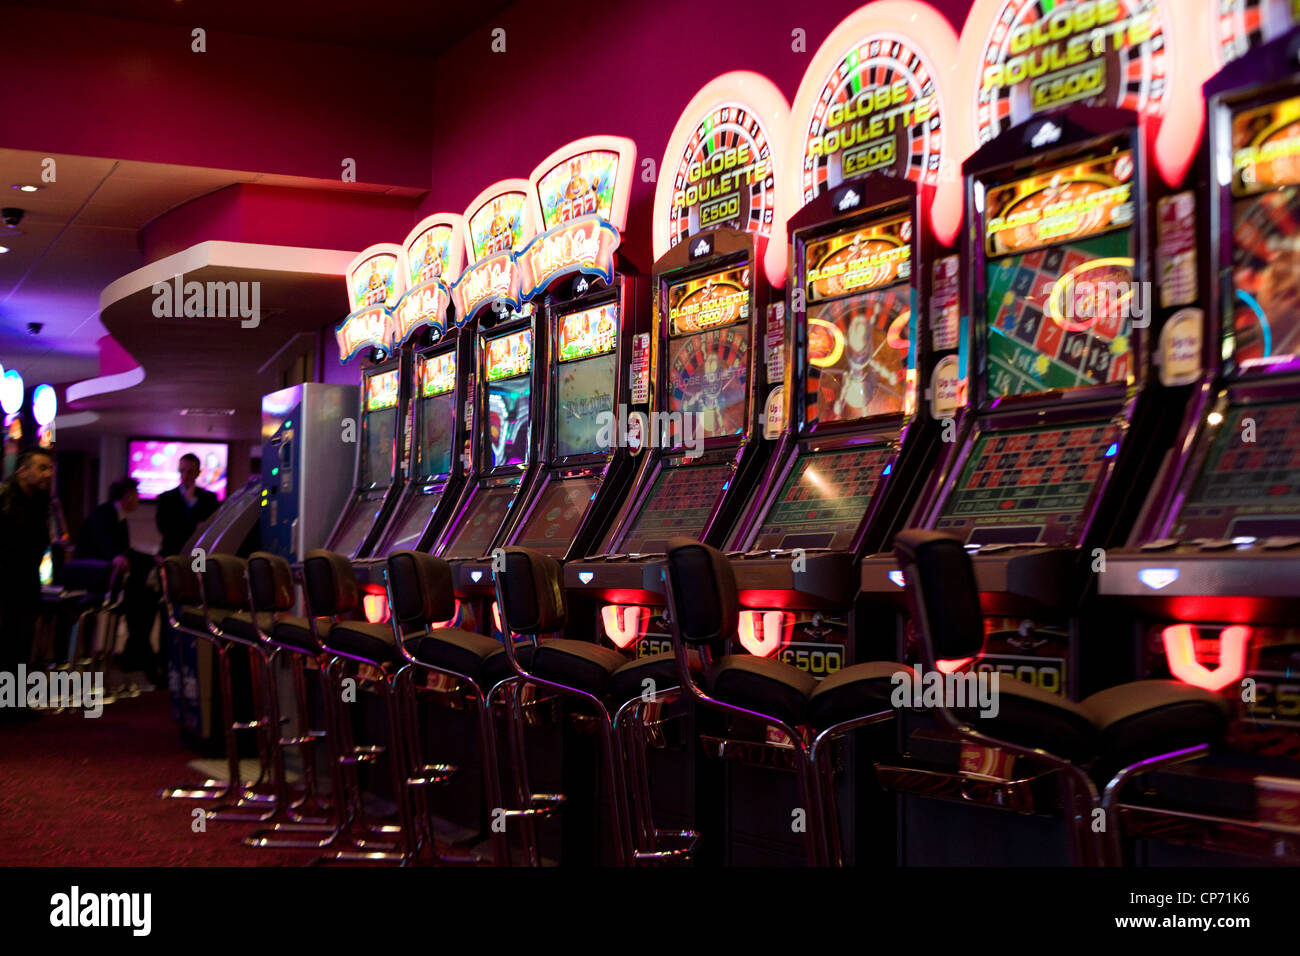 Free slot games mecca bingo actions casino